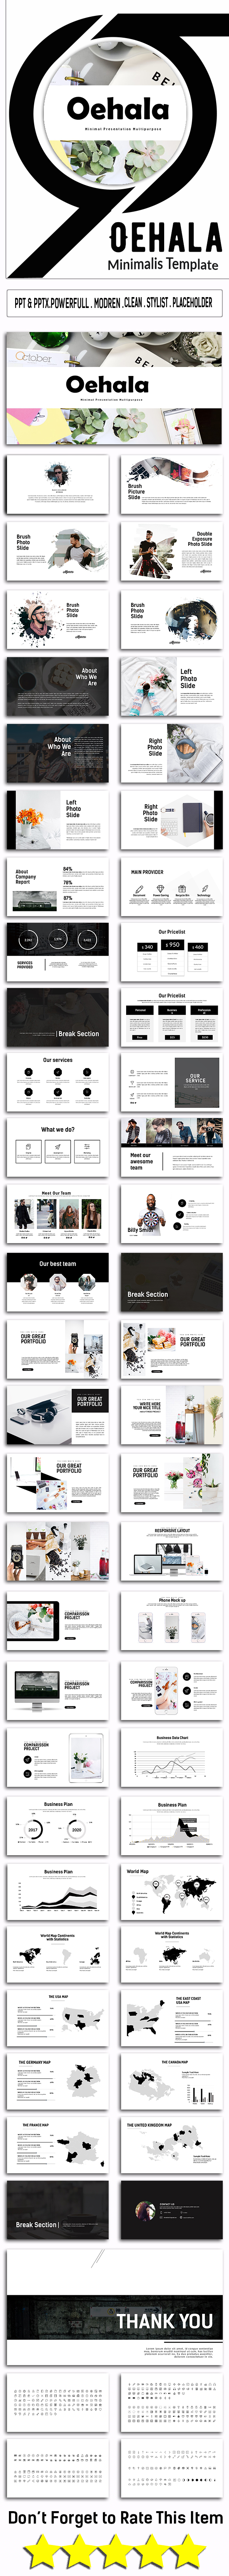 Oehala Business Presentation - PowerPoint Templates Presentation Templates